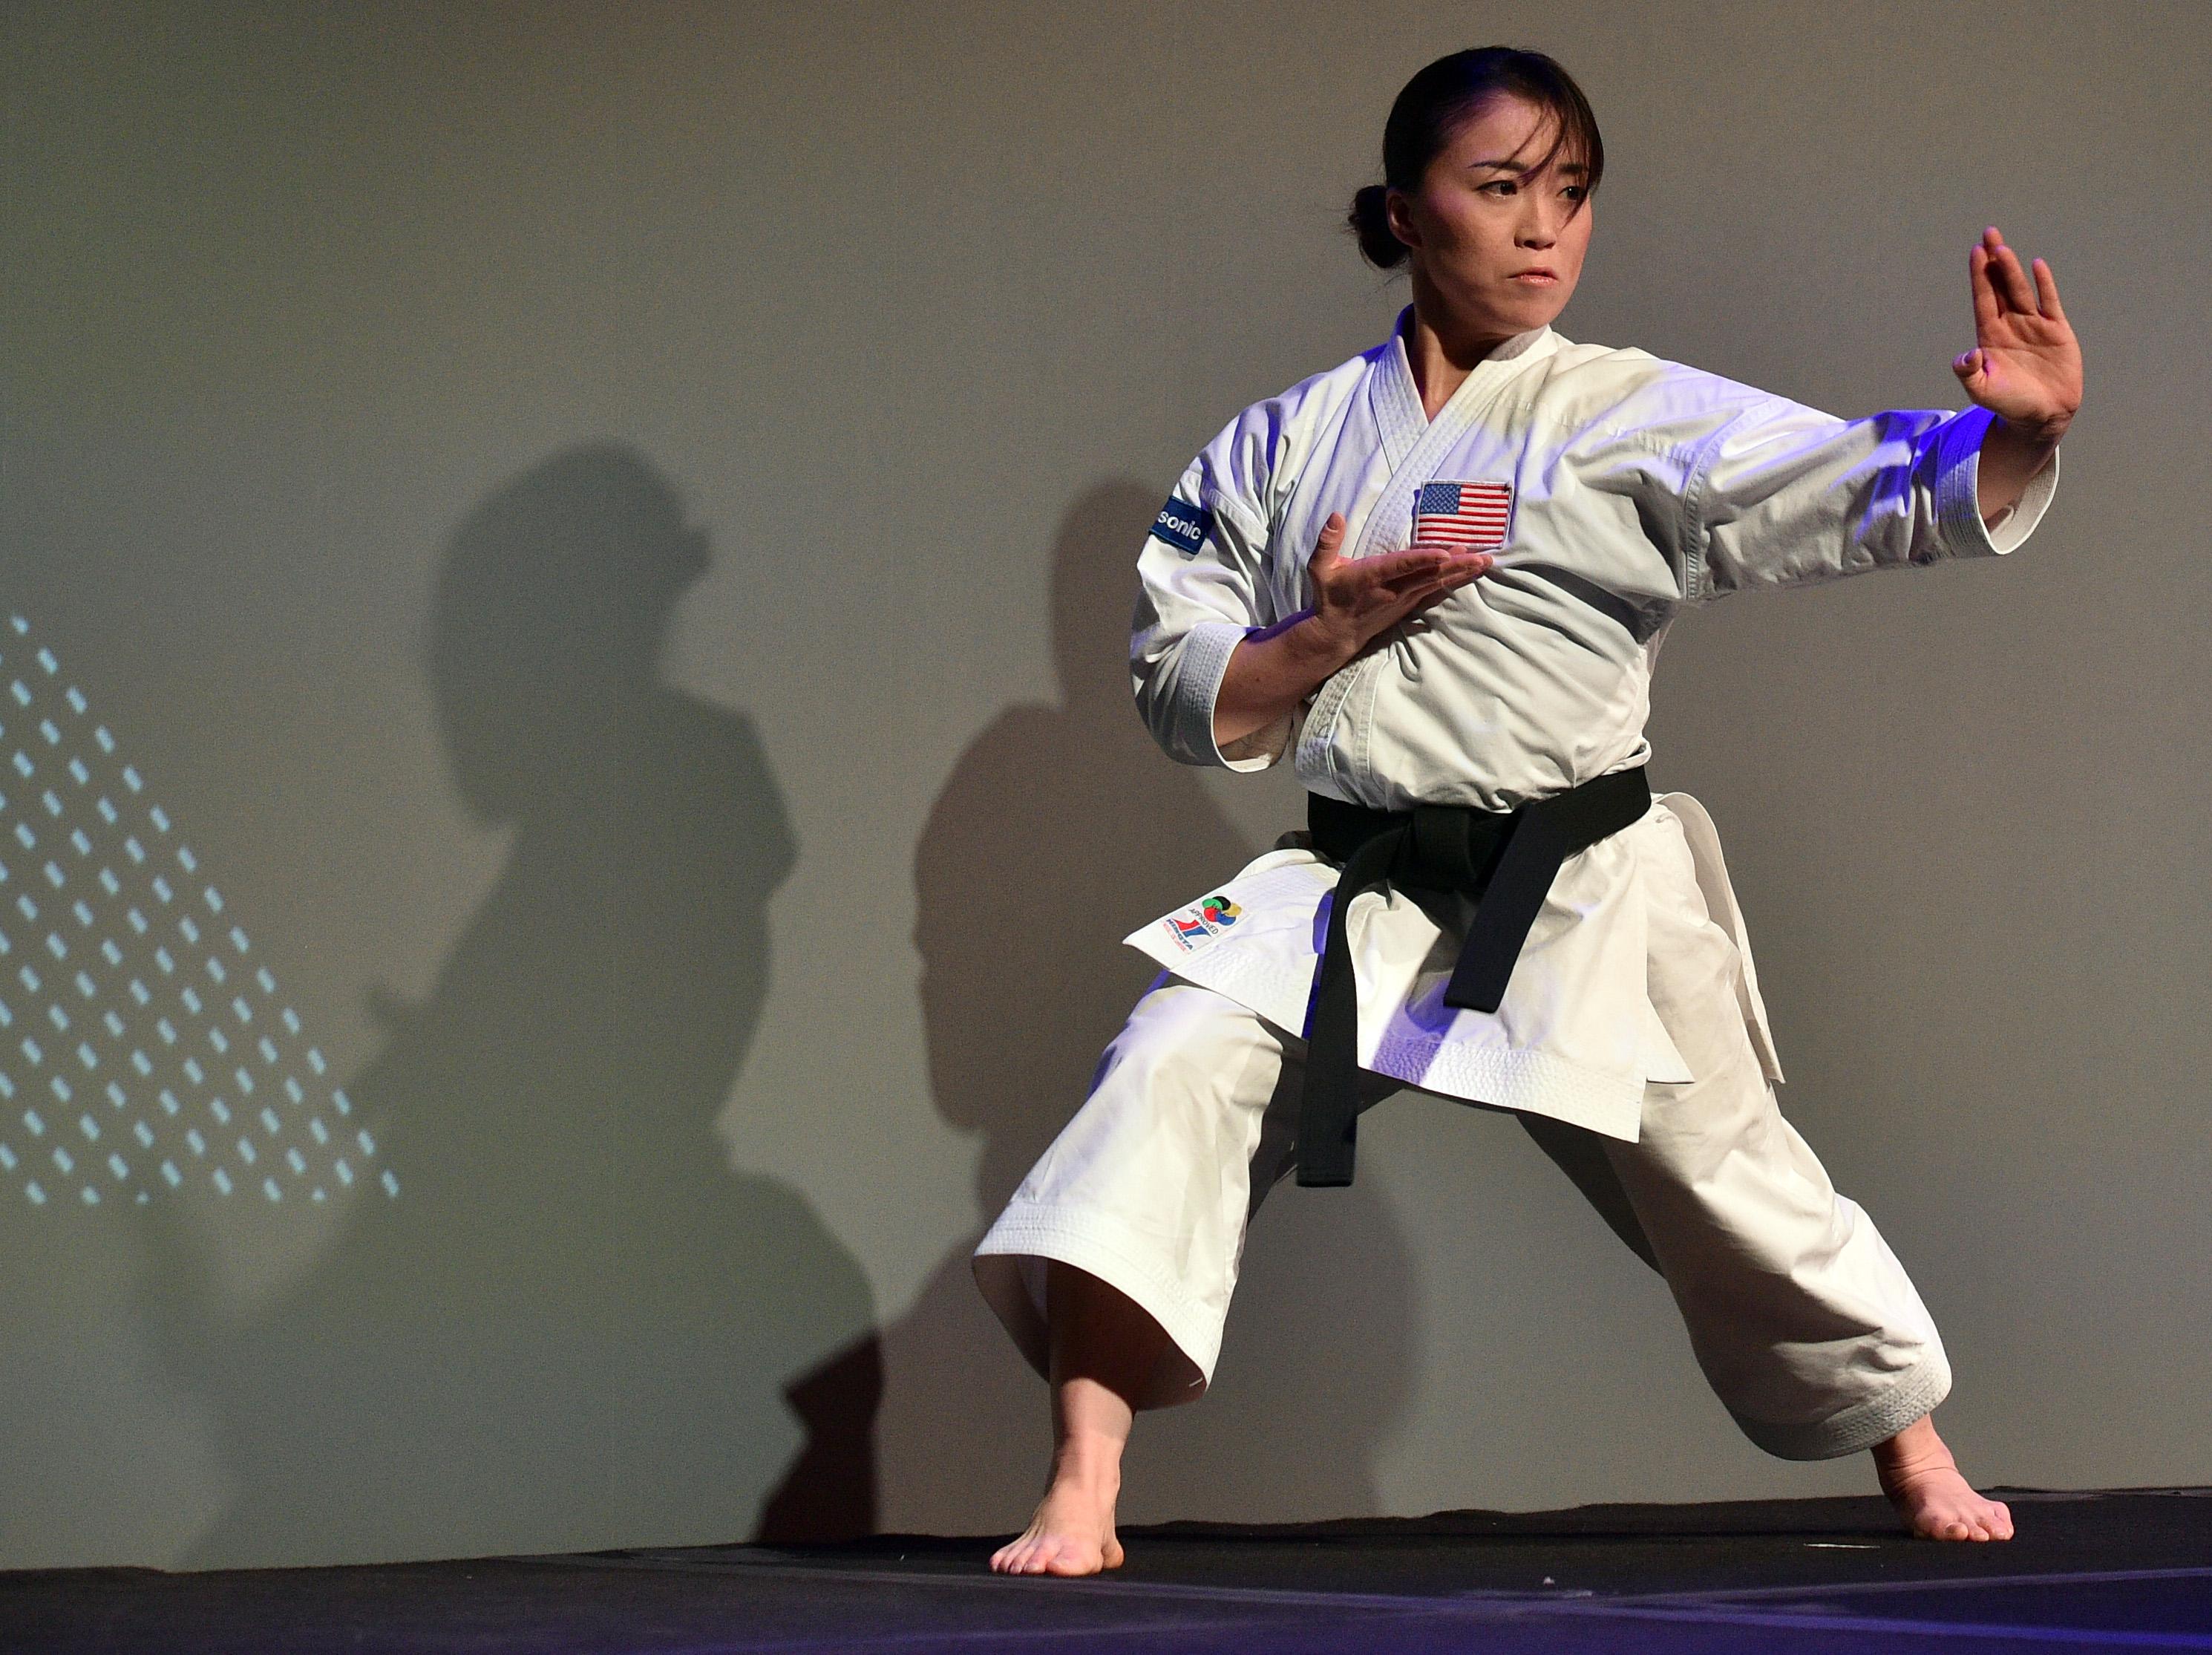 Olympic Karate Star Sakura Kokumai Victim of Vicious Anti-Asian Hatred While Training for Tokyo Games